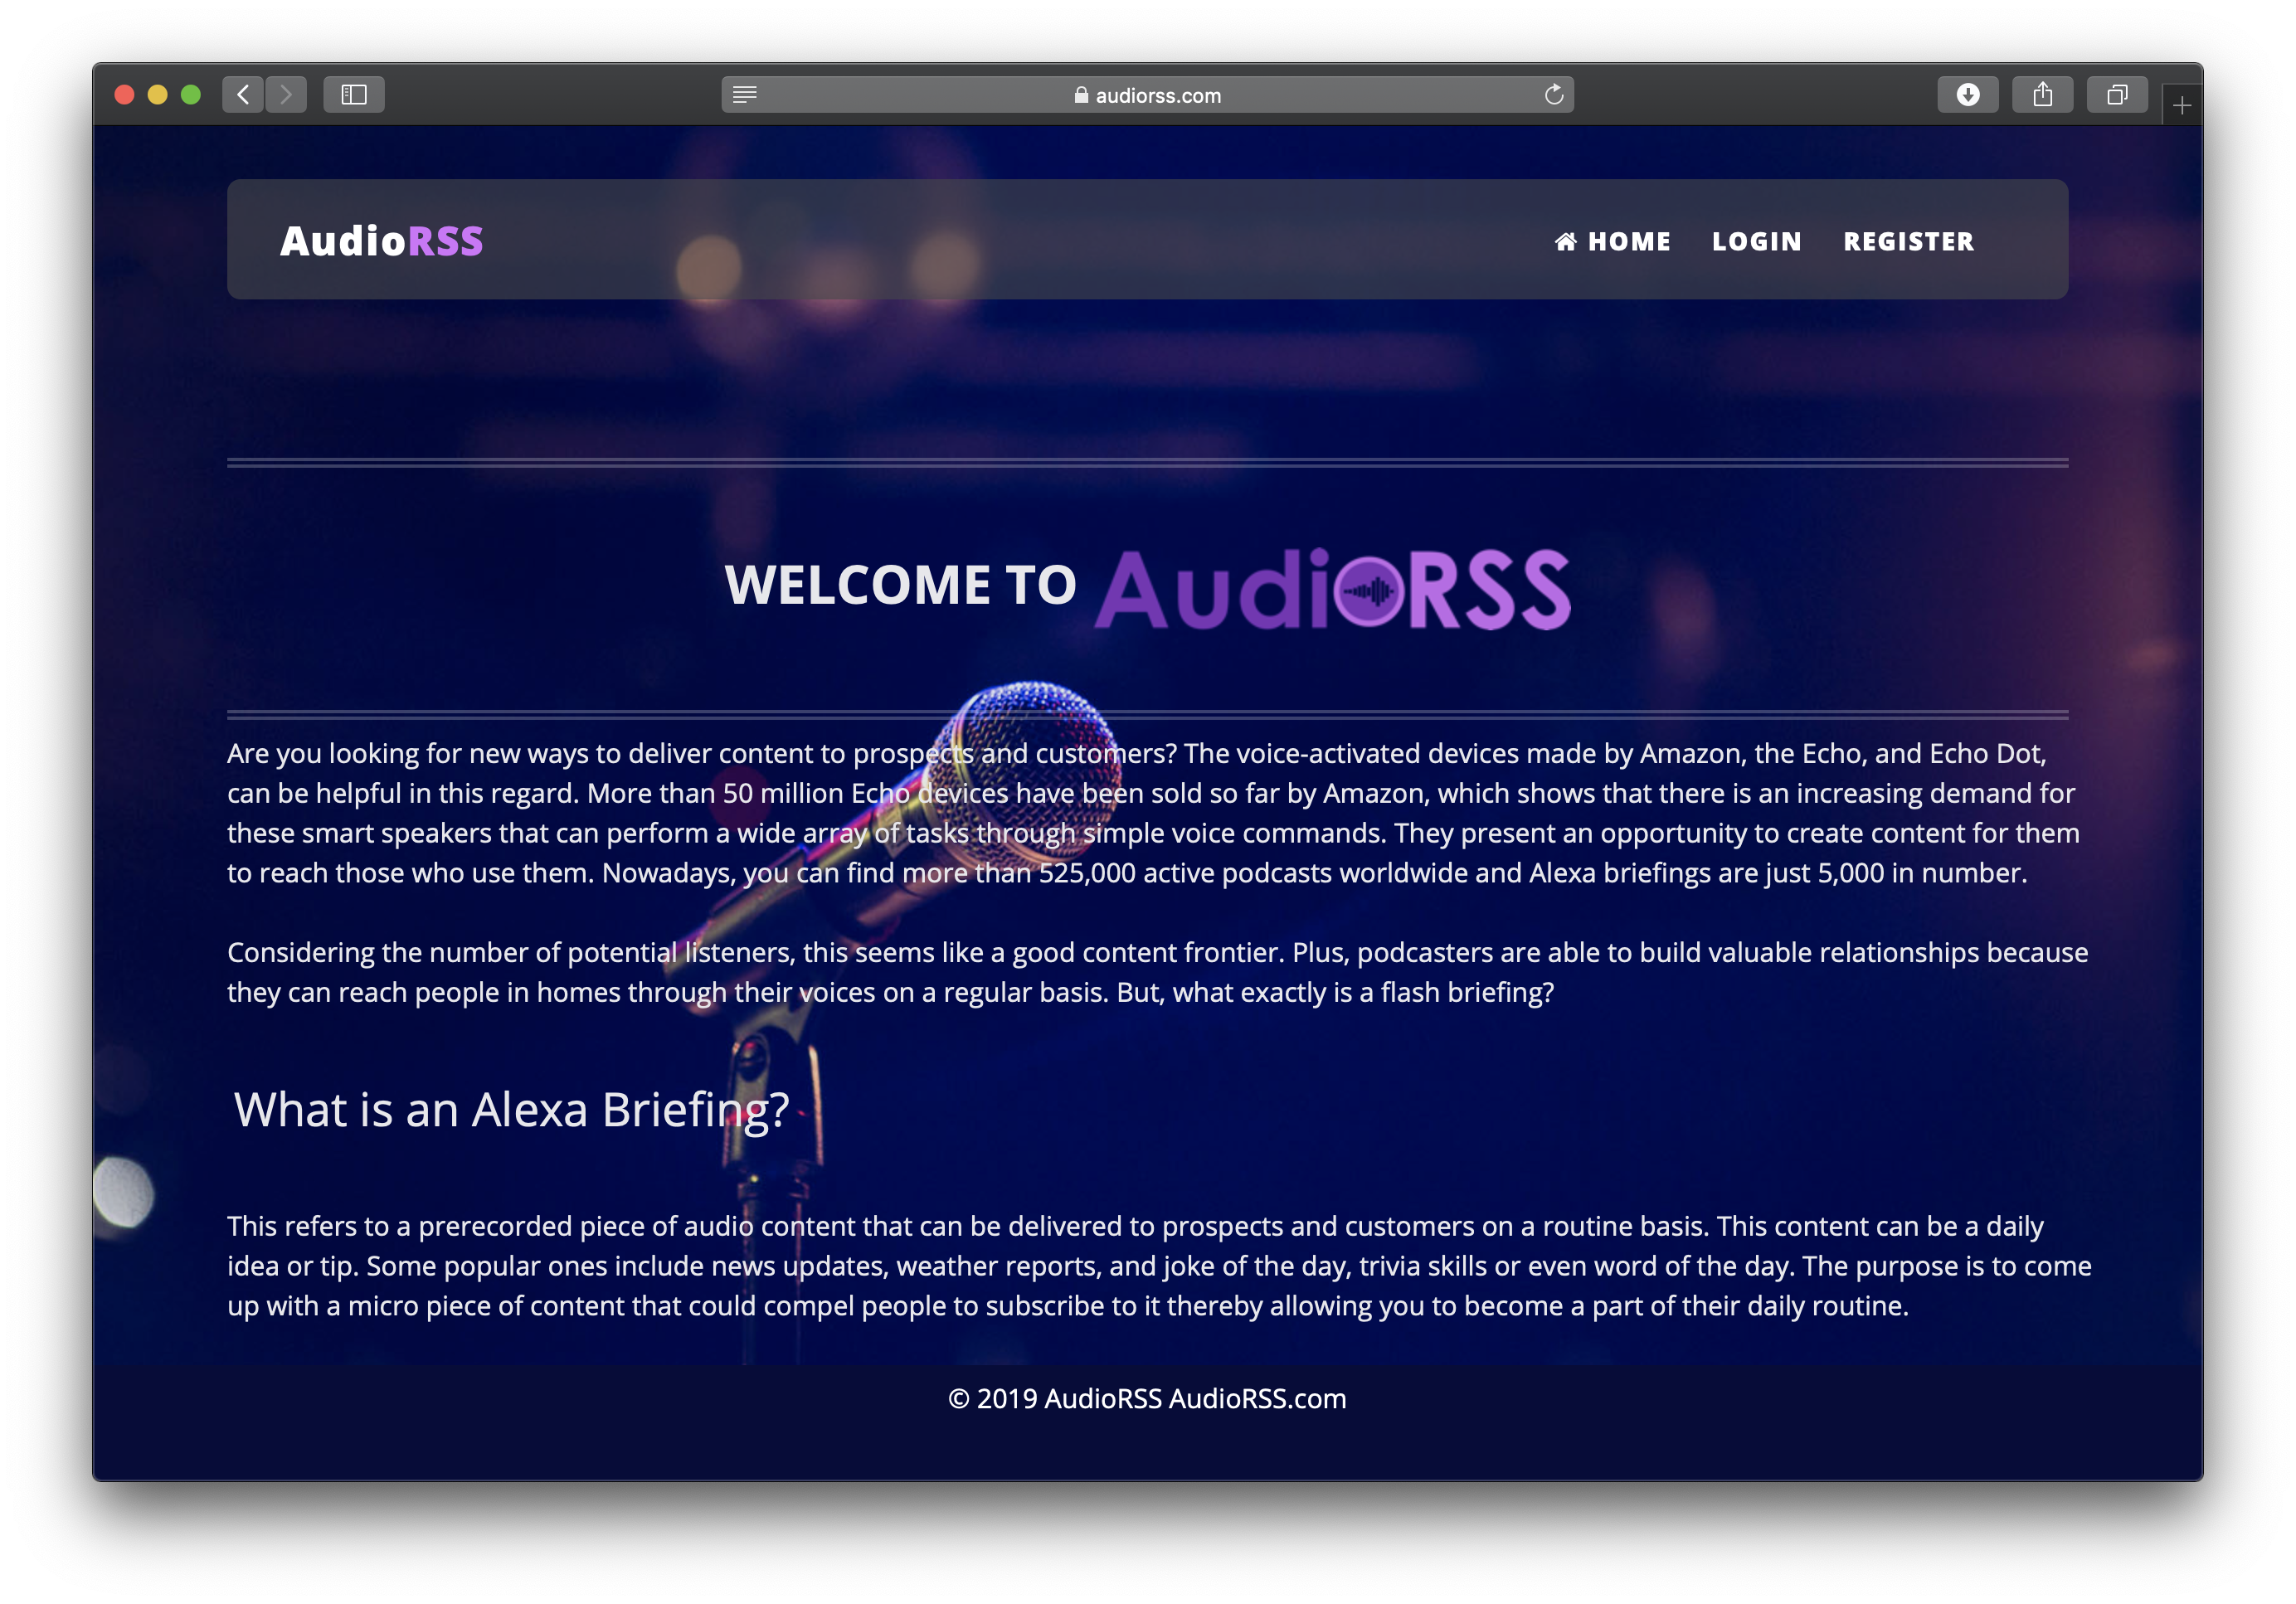 audiorss.com-welcome.png